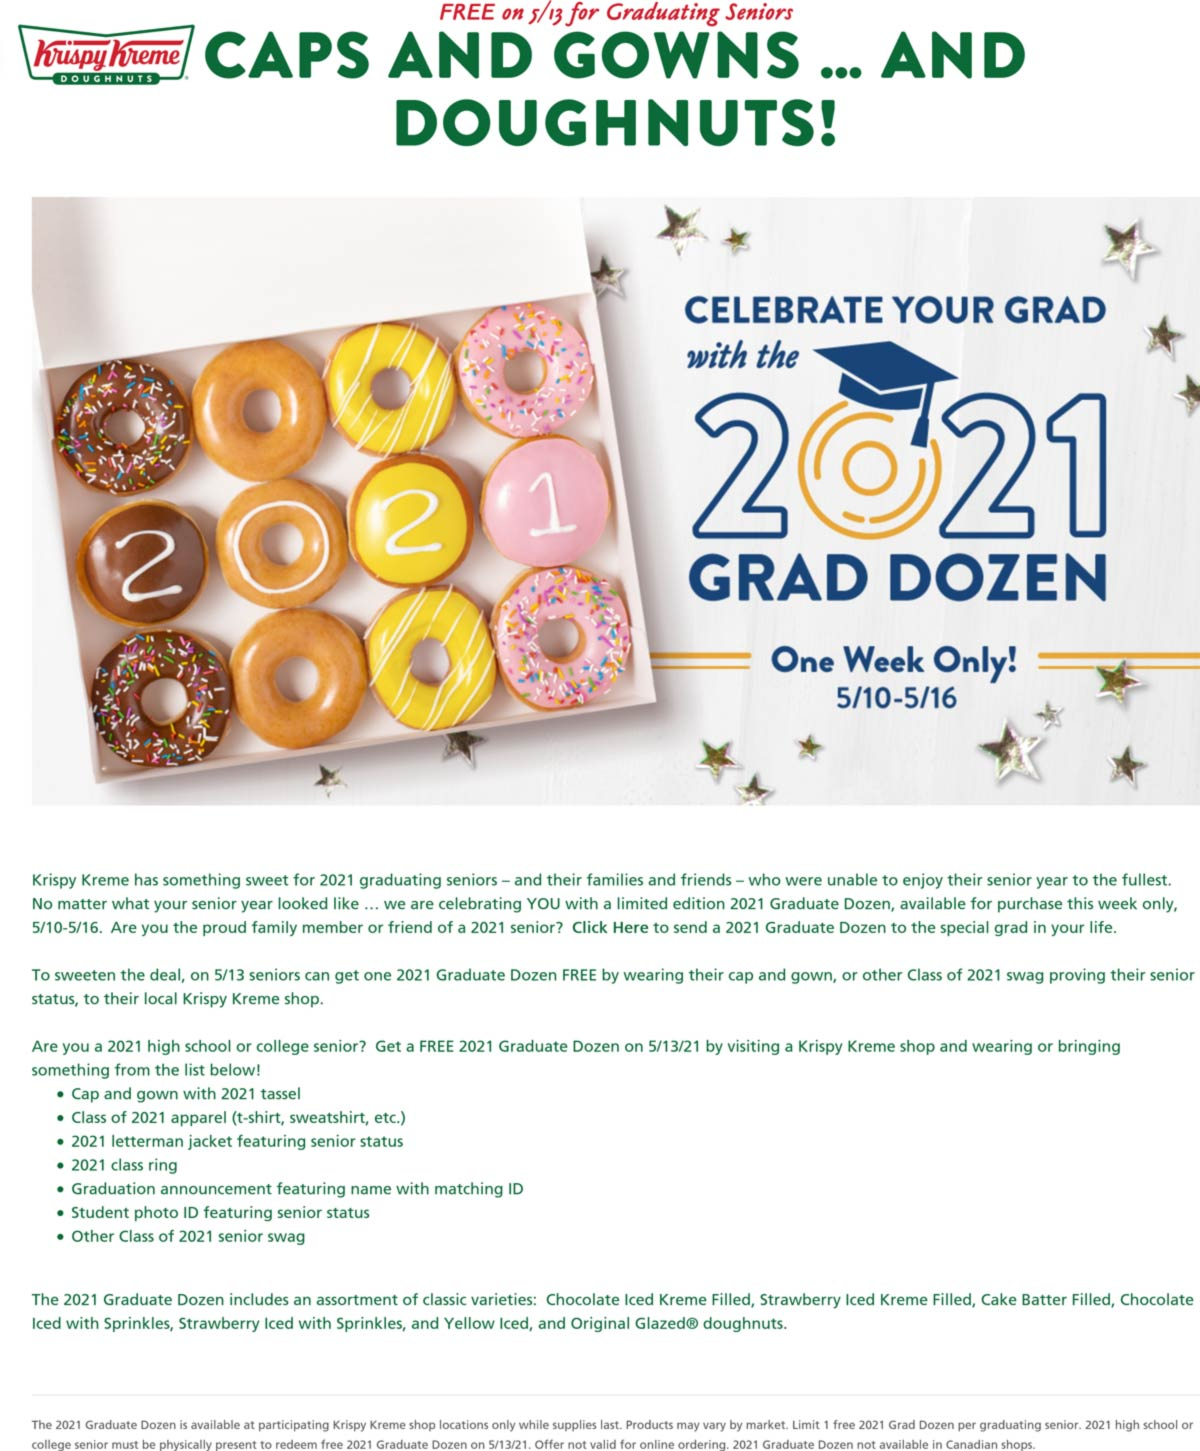 Krispy Kreme restaurants Coupon  Graduating seniors enjoy a dozen free donuts Thursday at Krispy Kreme #krispykreme